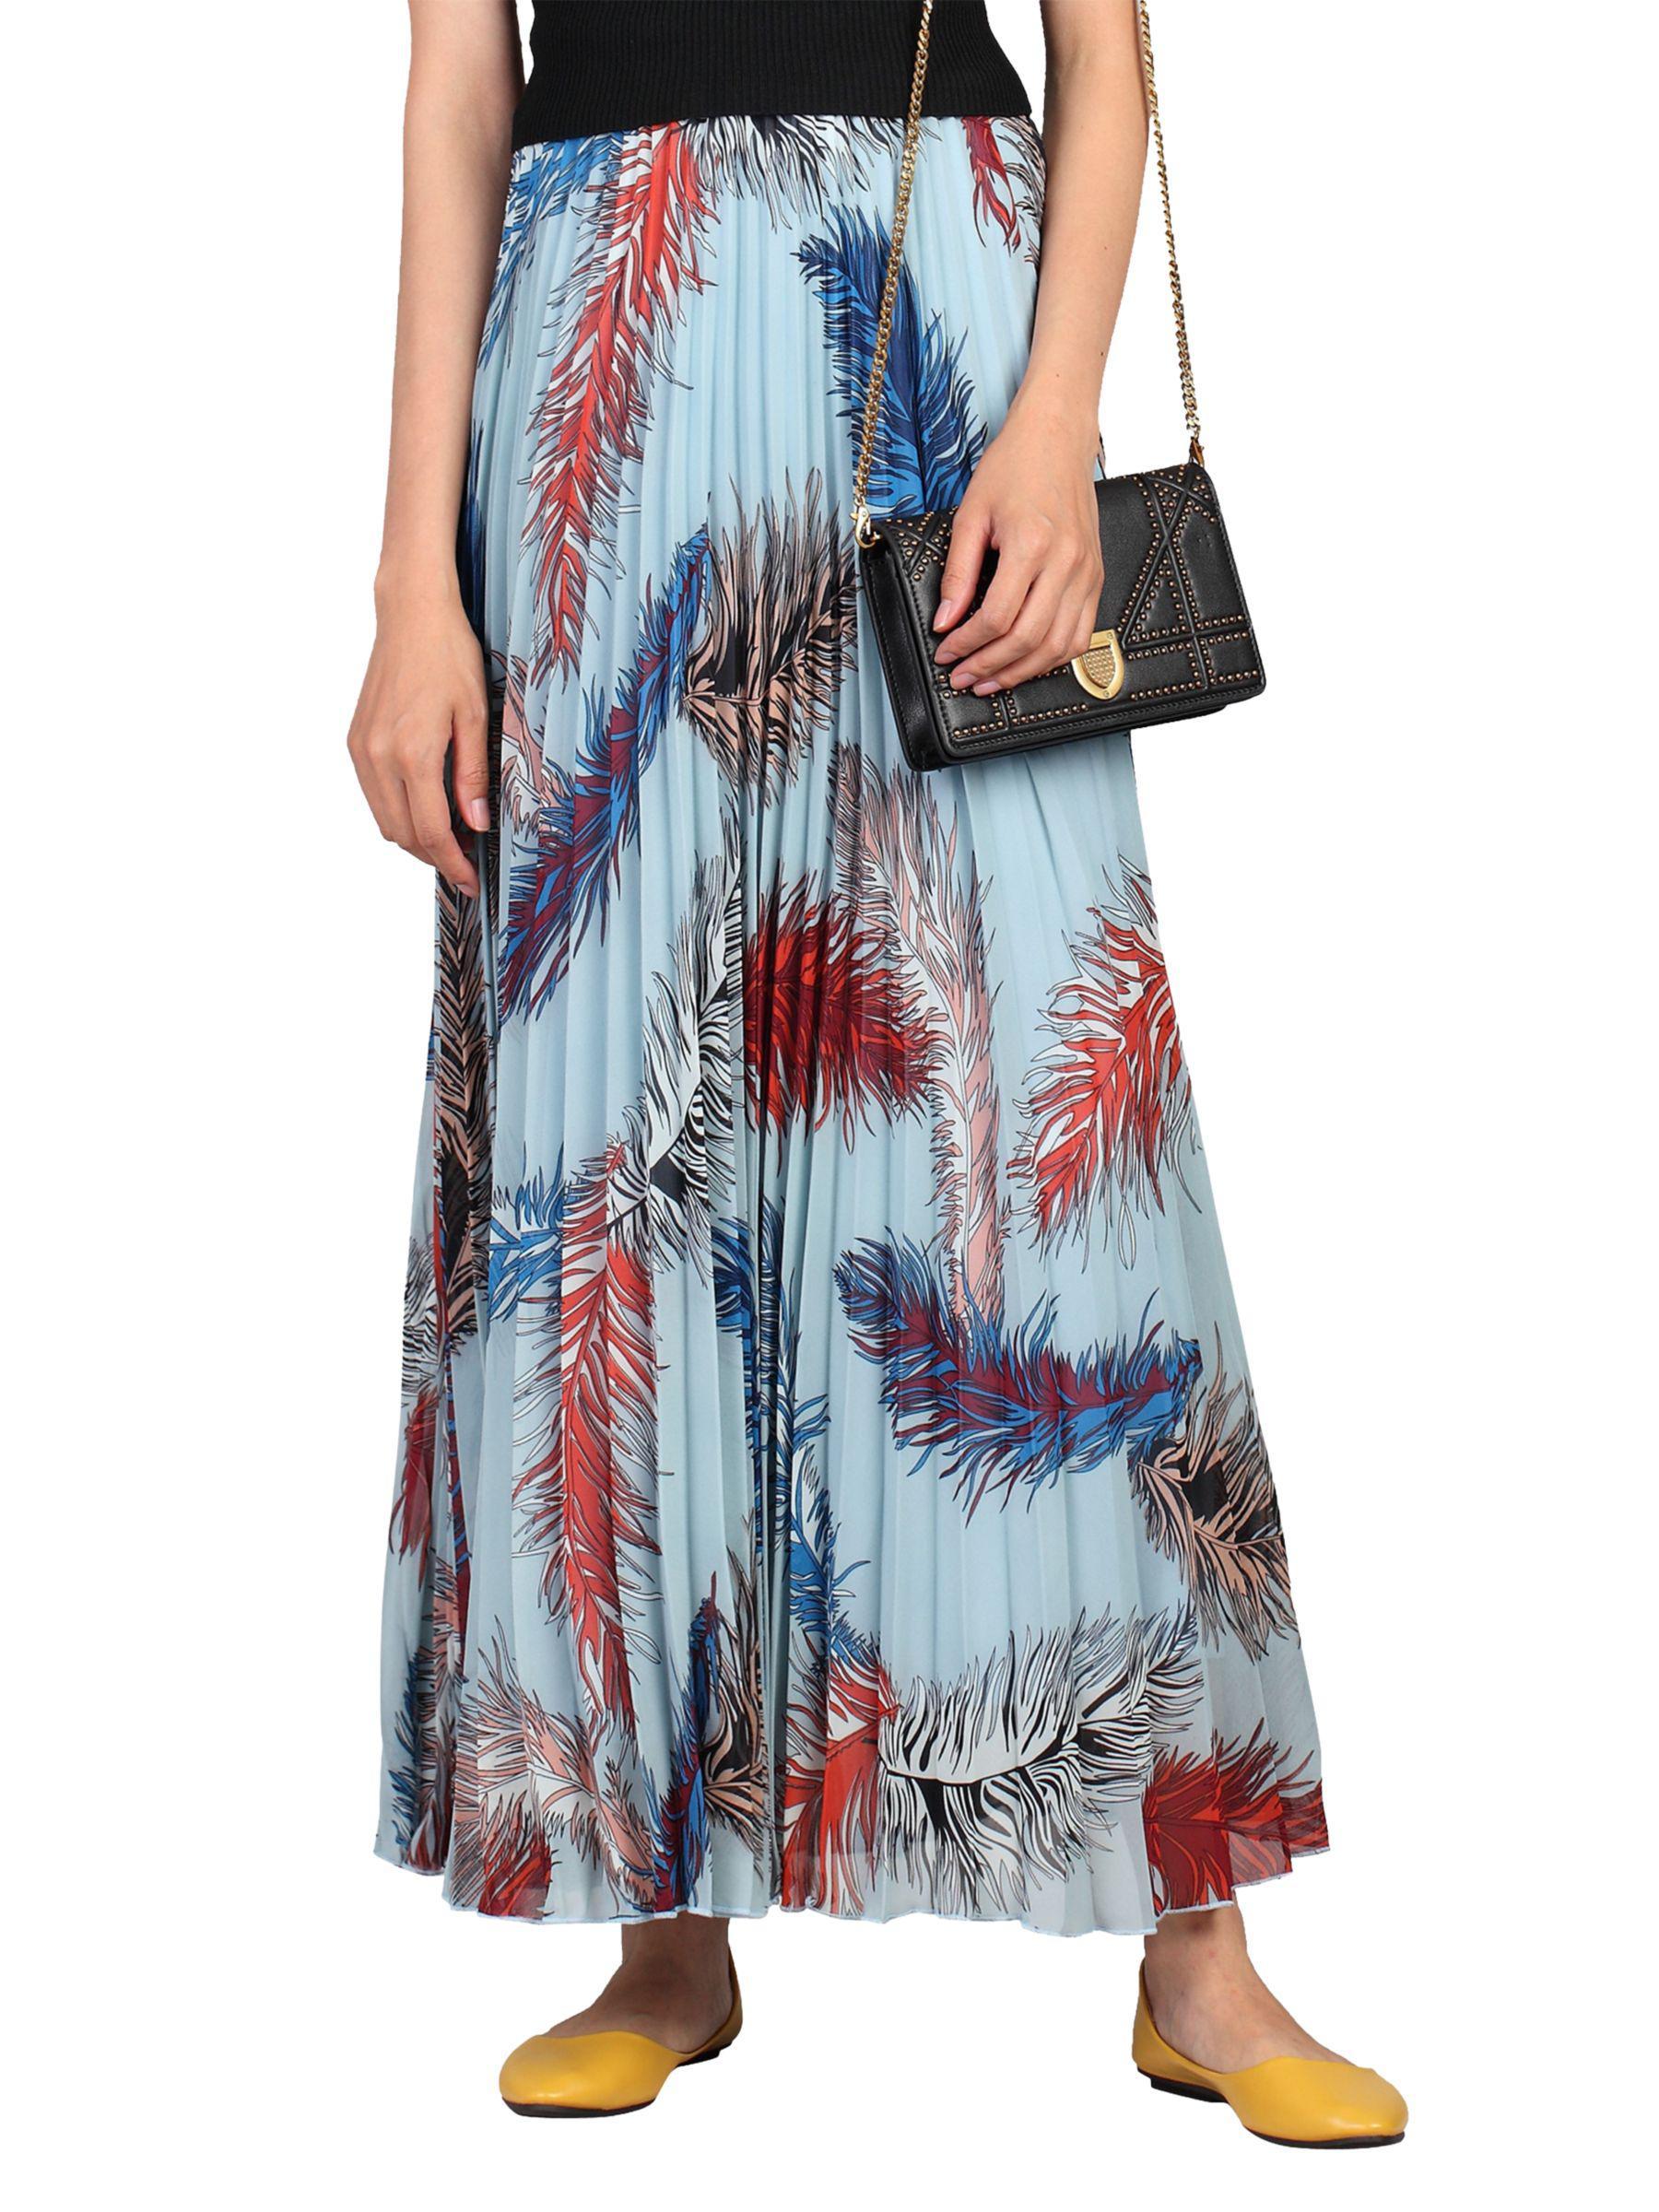 766a6d936c Jolie Moi Pleated Feather Maxi Skirt in Blue - Lyst